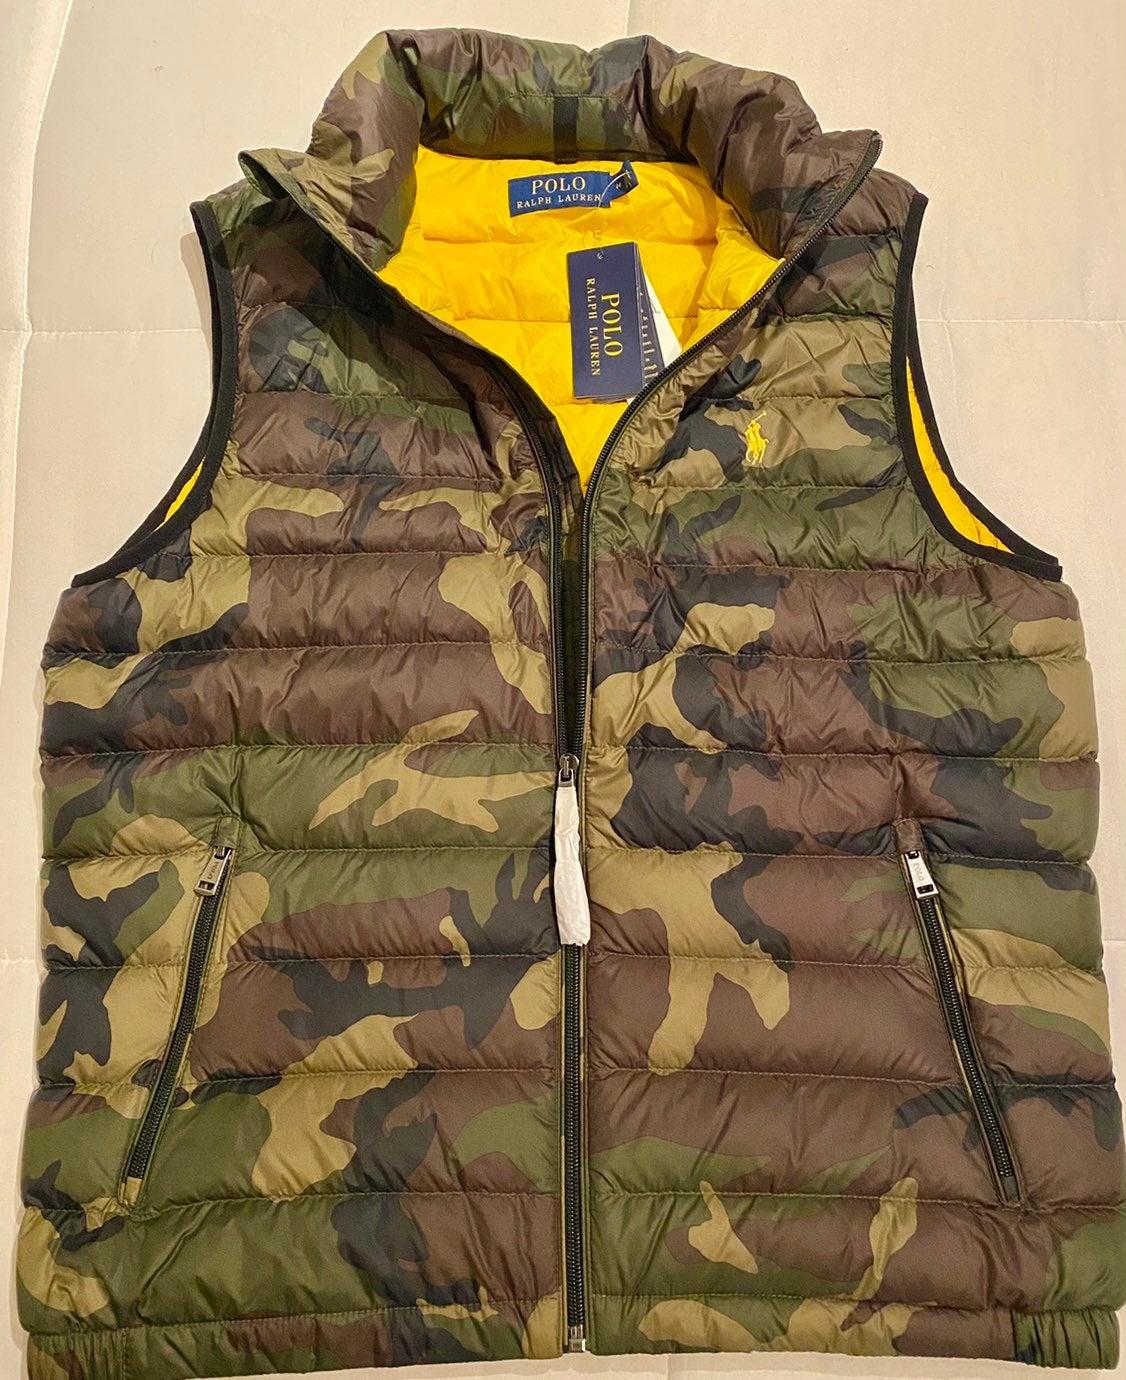 Polo Ralph Lauren Puffer Camo Vest, Med.